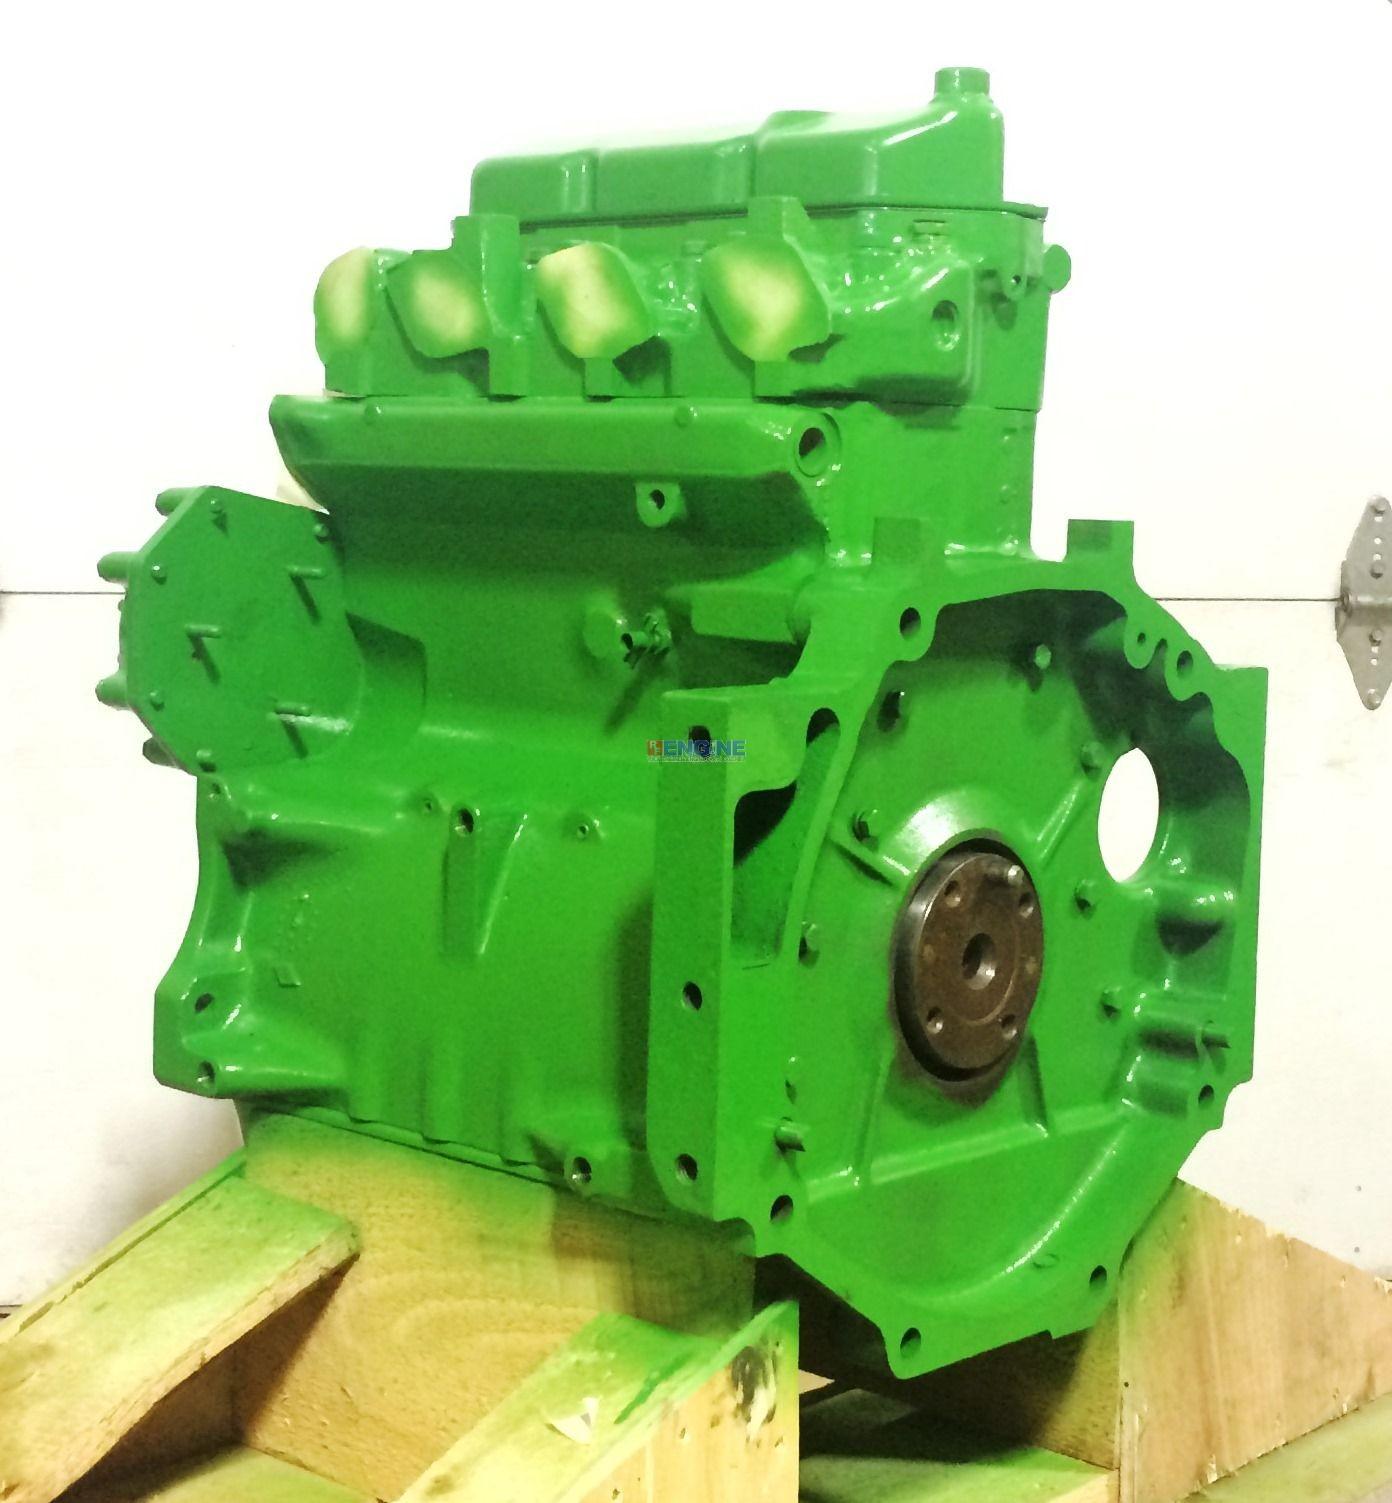 John Deere 1020 Engine : R f engine john deere jd long block